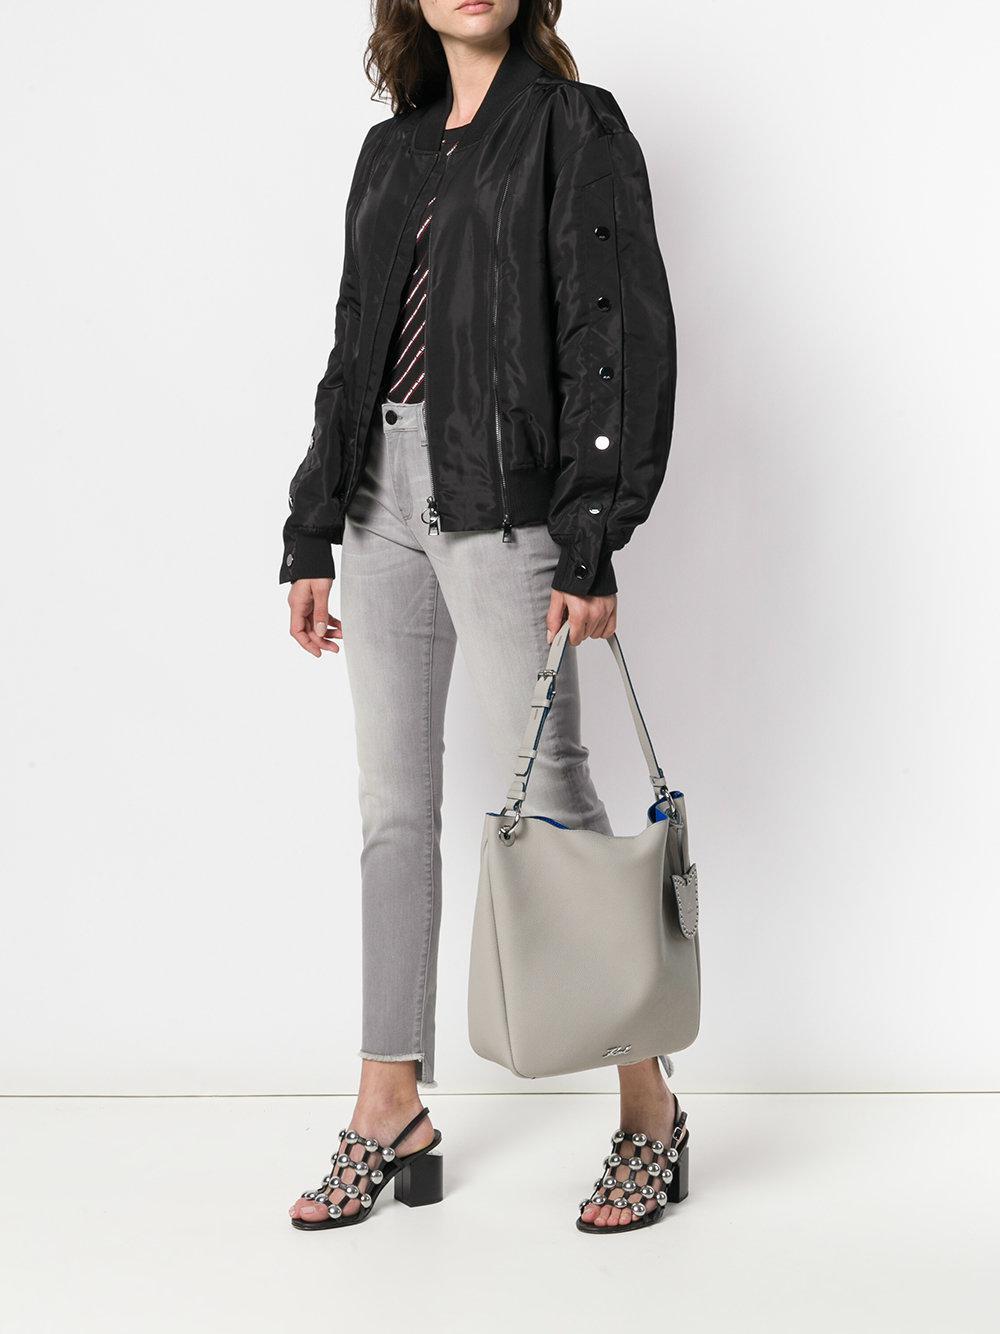 Karl Lagerfeld Leather Karry All Hobo Tote Bag in Grey (Grey)